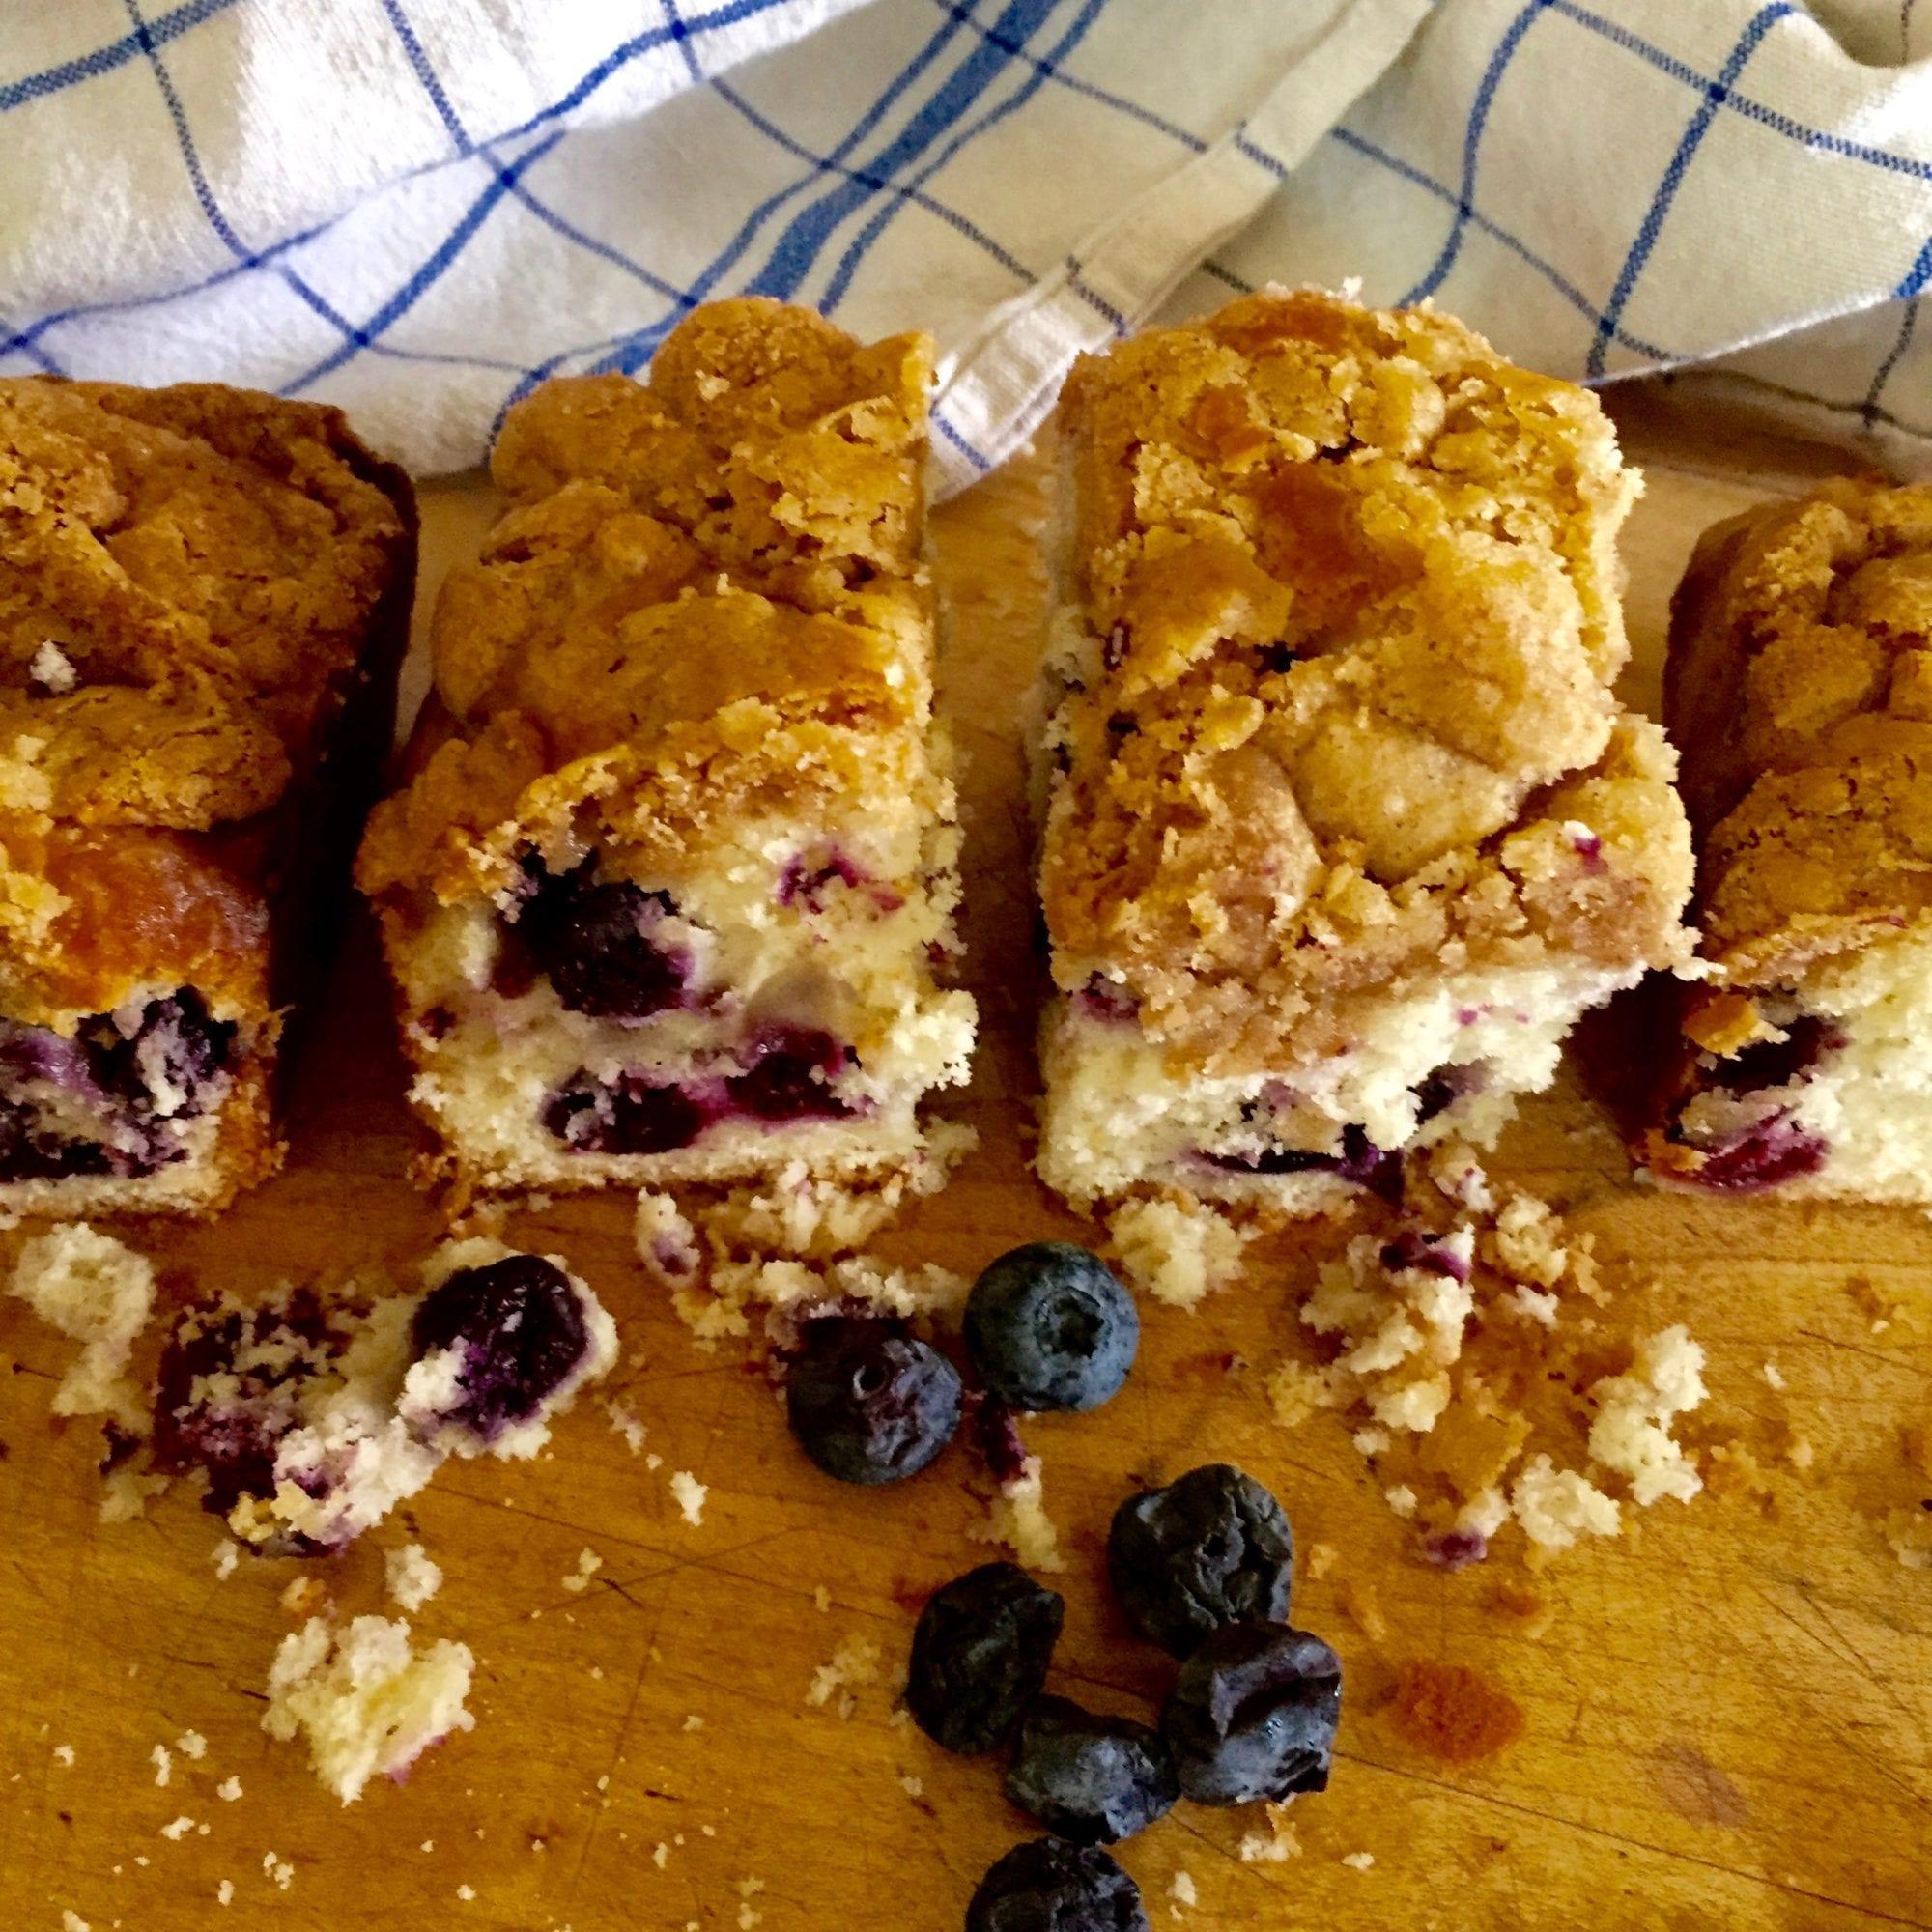 Blueberry Buttermilk Snack Cake Recipe | Jessie Sheehan Bakes